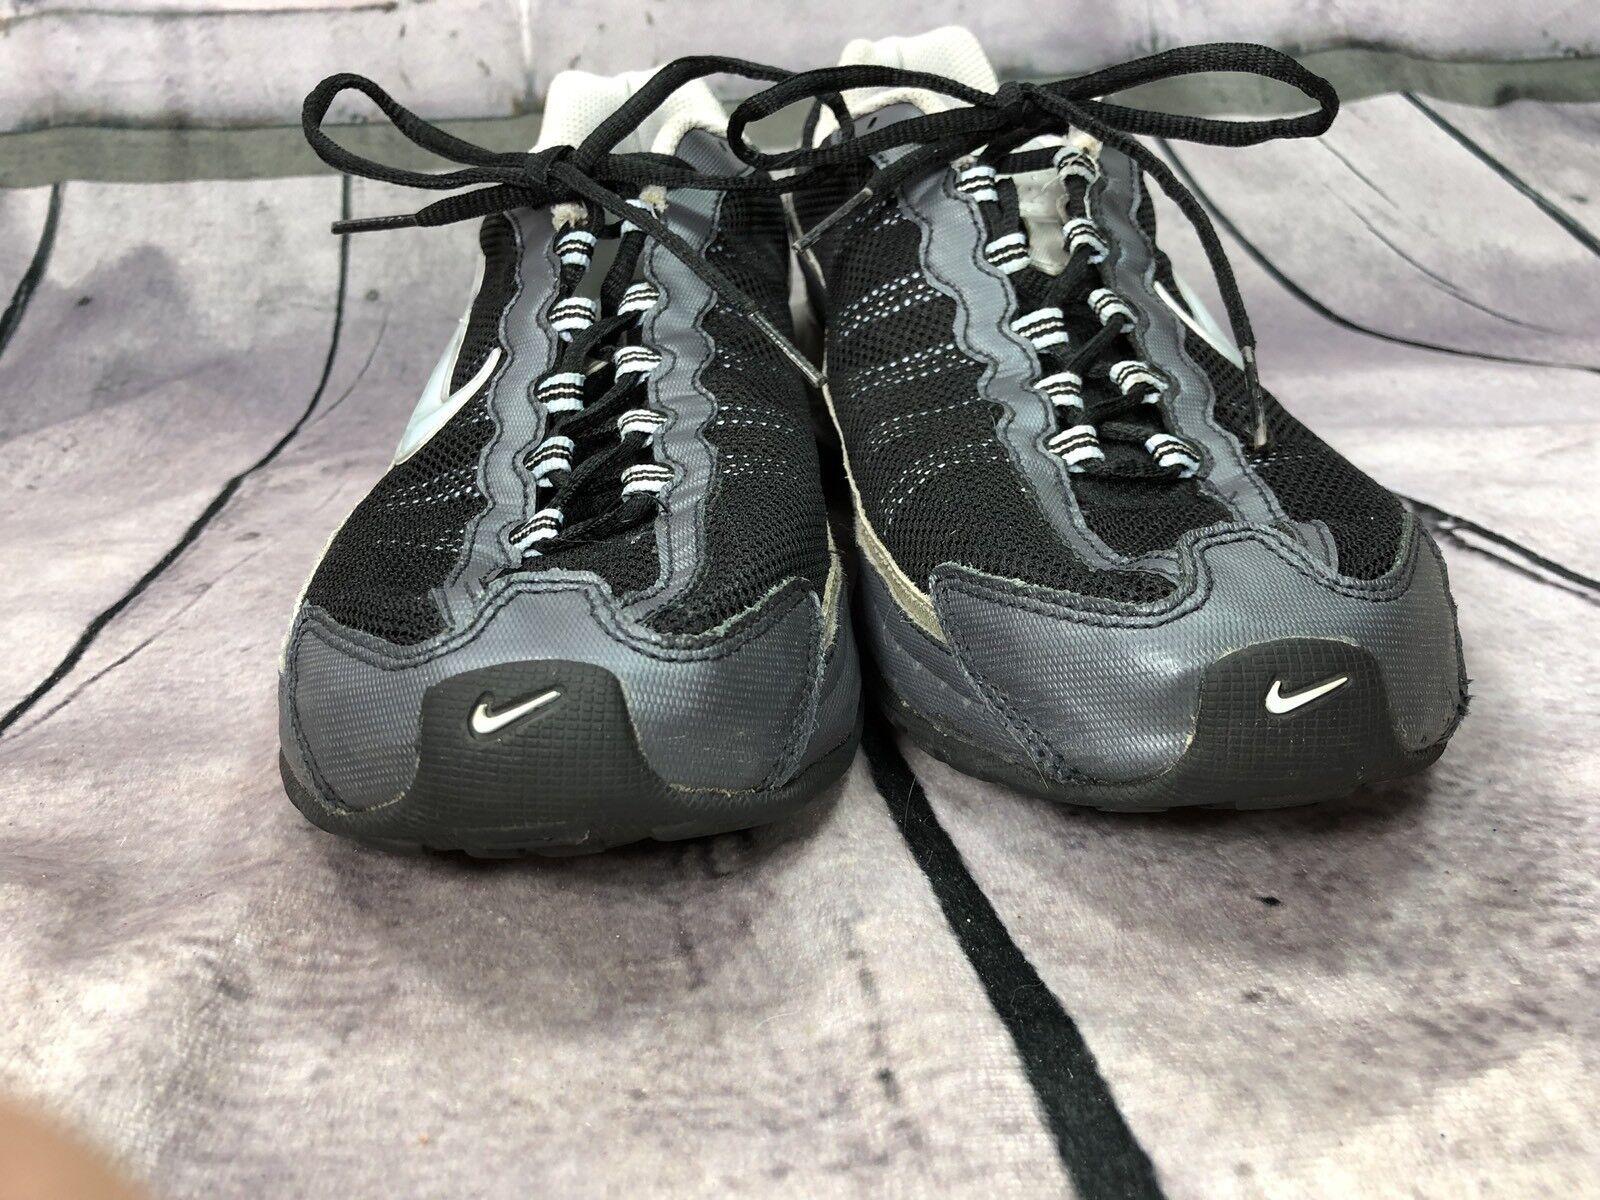 Nike Damenschuhe Sneakers Schuhes Blau Reax Trail Running Training Blau Schuhes Sz 11 636661